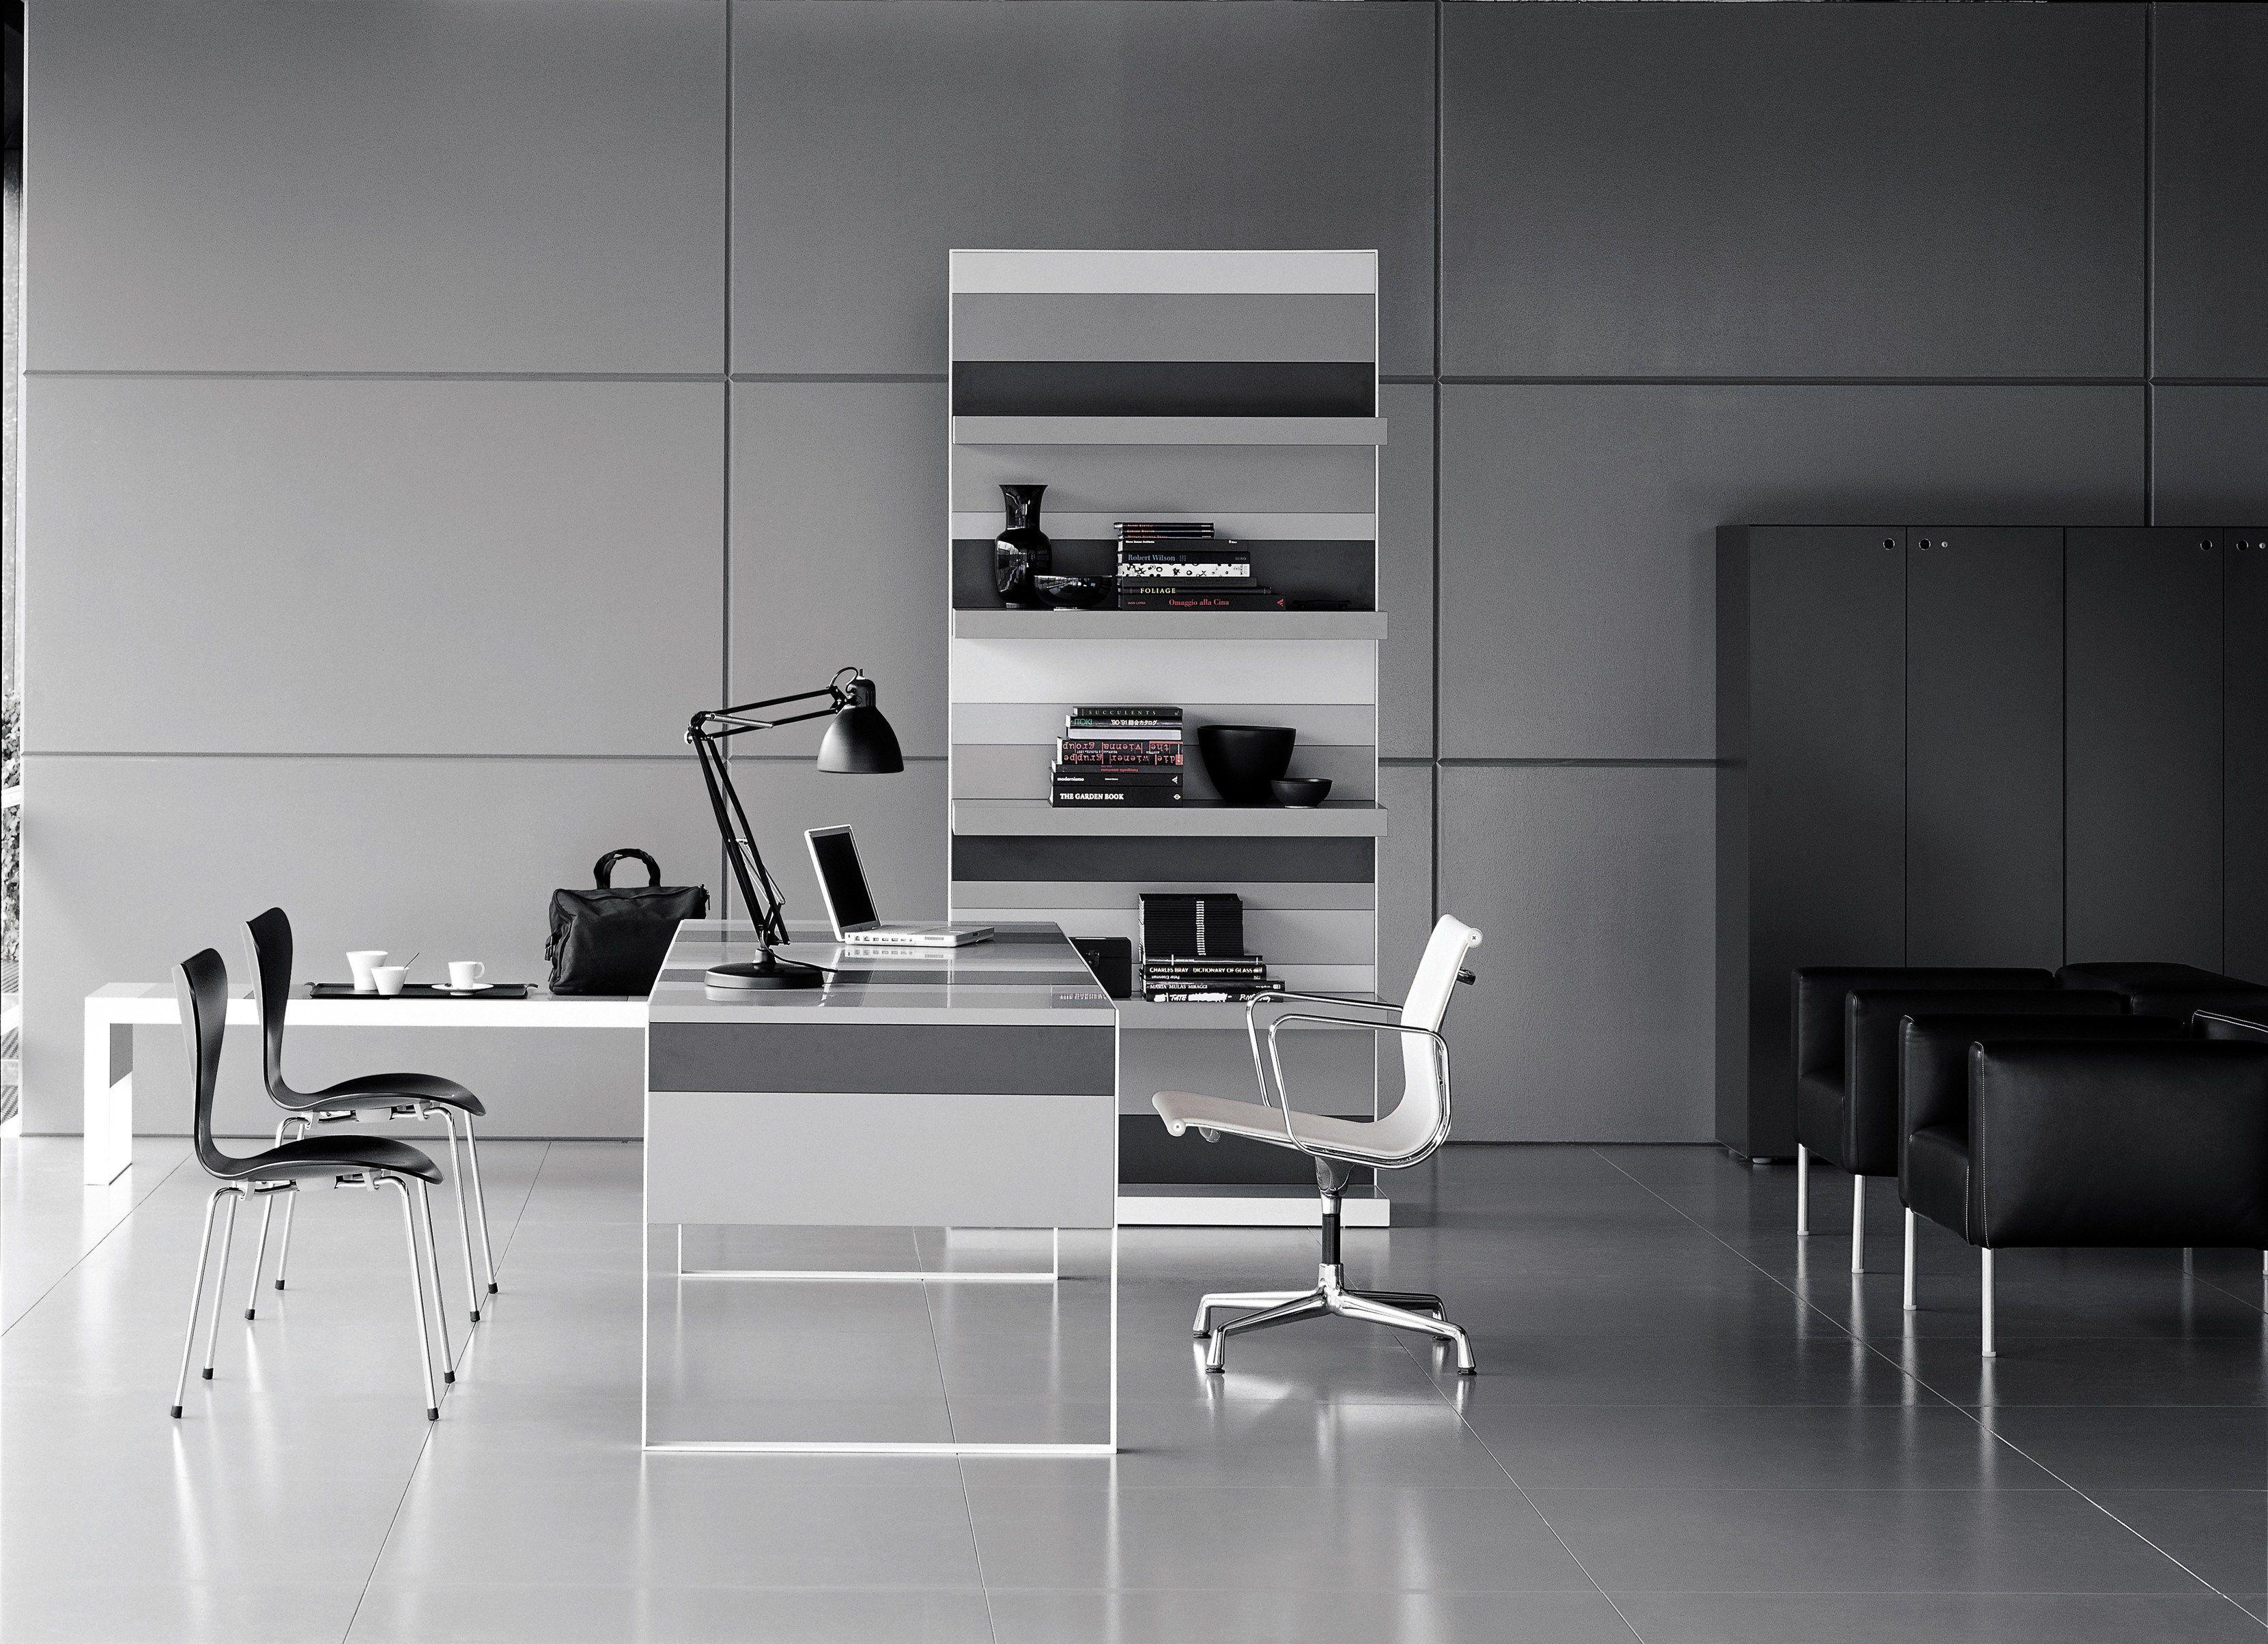 fantoni office furniture. STRIPES Bureau By FANTONI. Office DesksExecutive Fantoni Furniture I